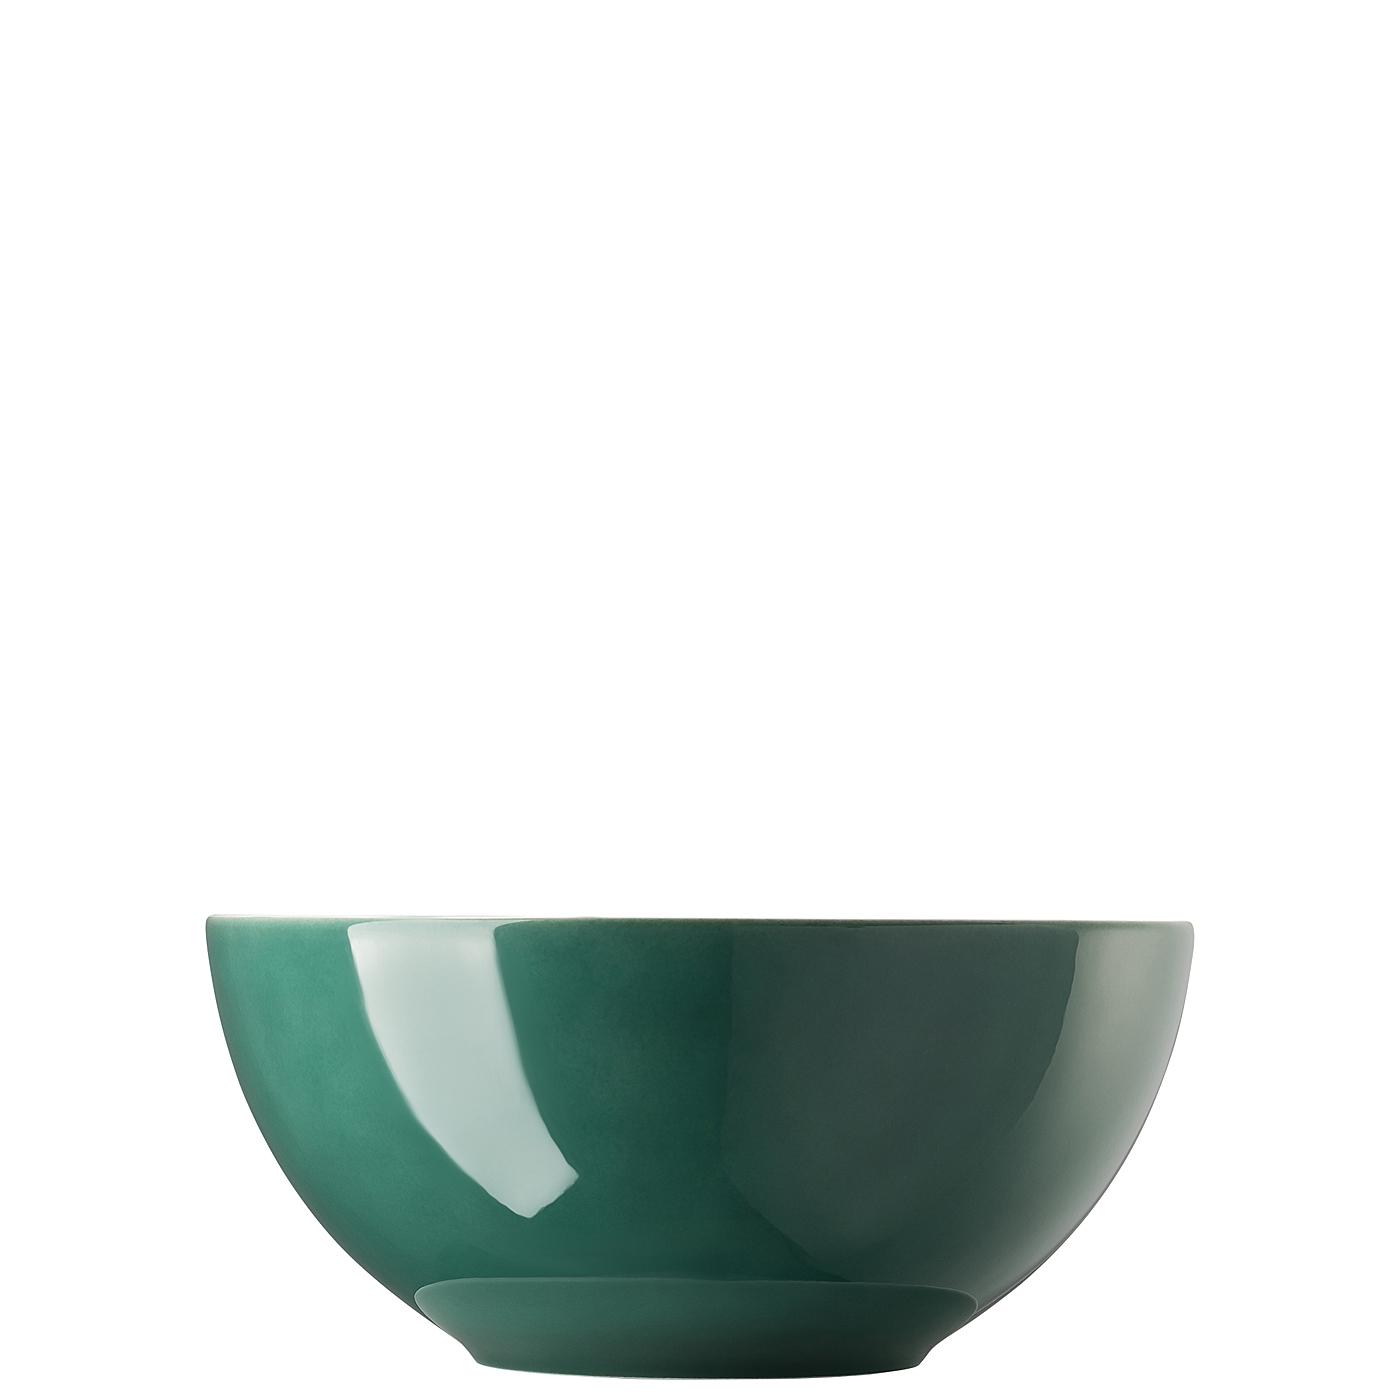 Schüssel 24 cm Sunny Day Herbal Green Thomas Porzellan